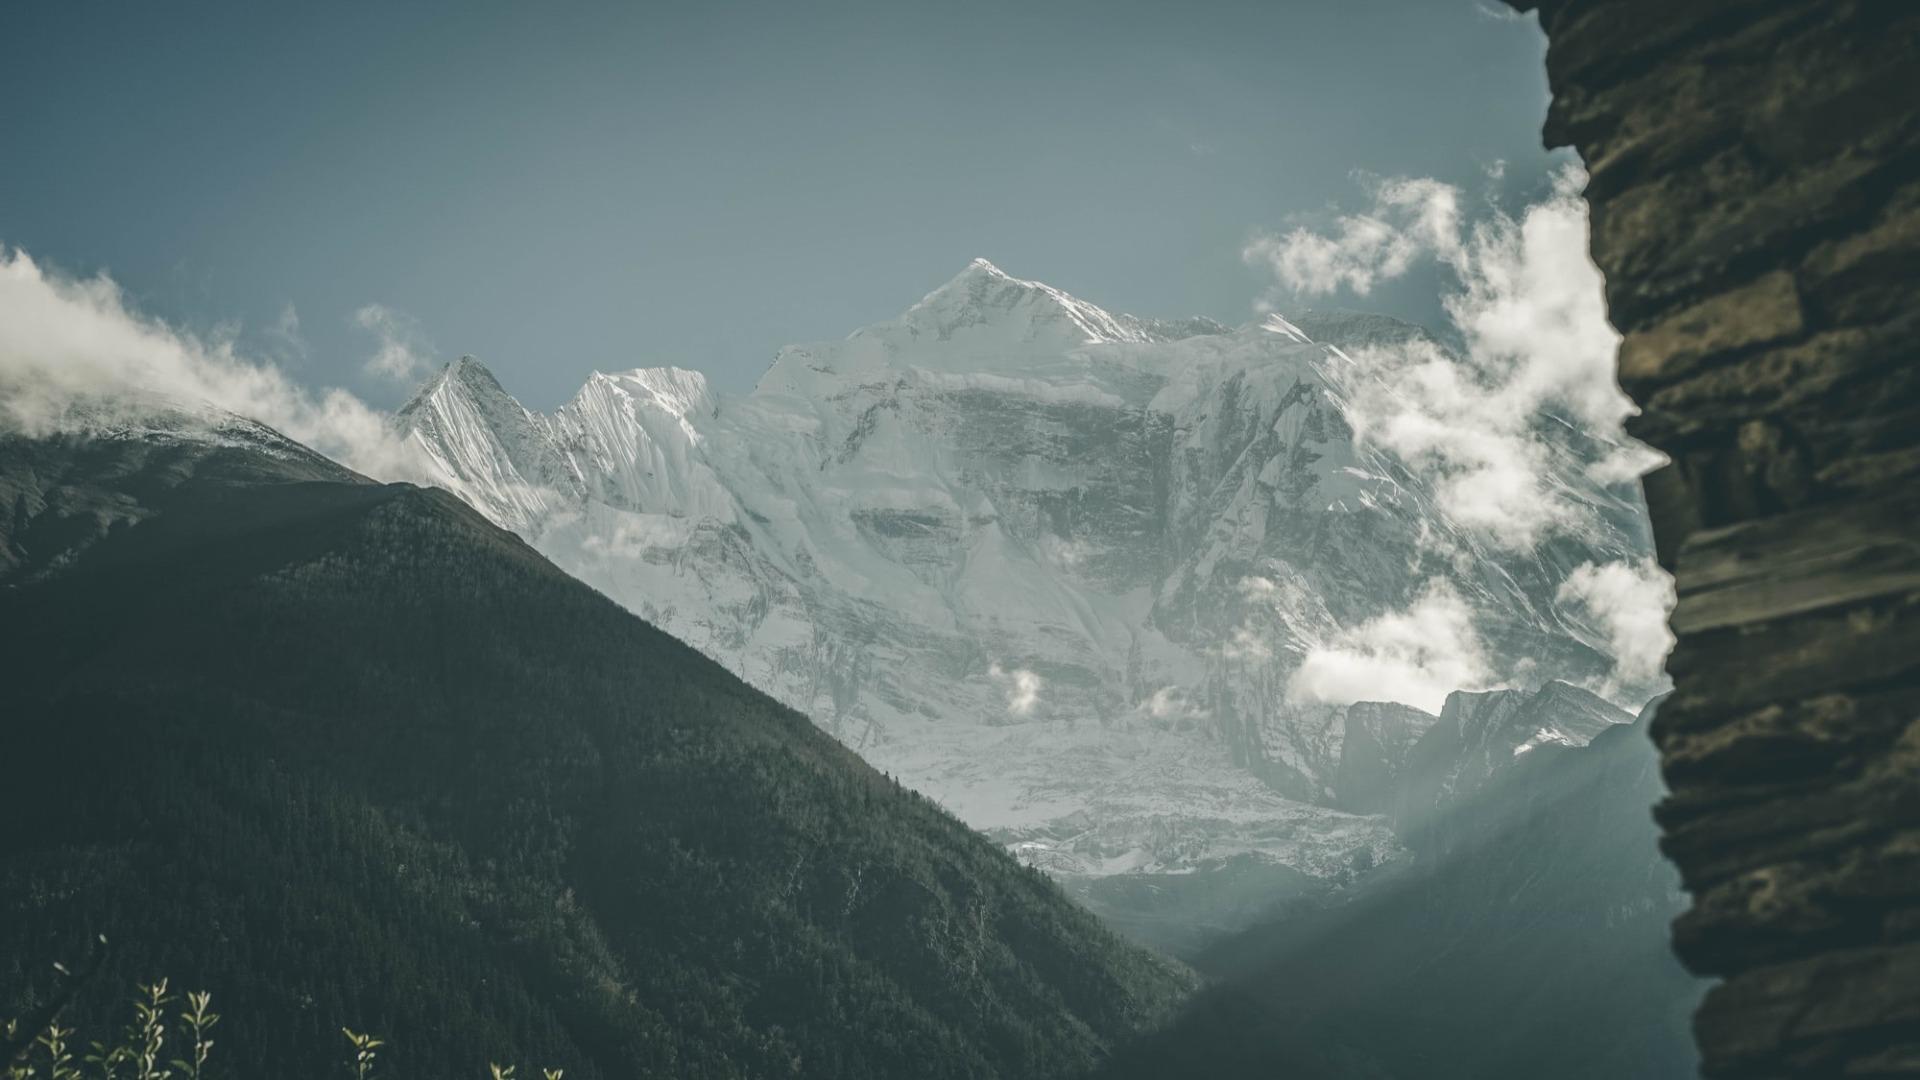 mächtiger Himalaya